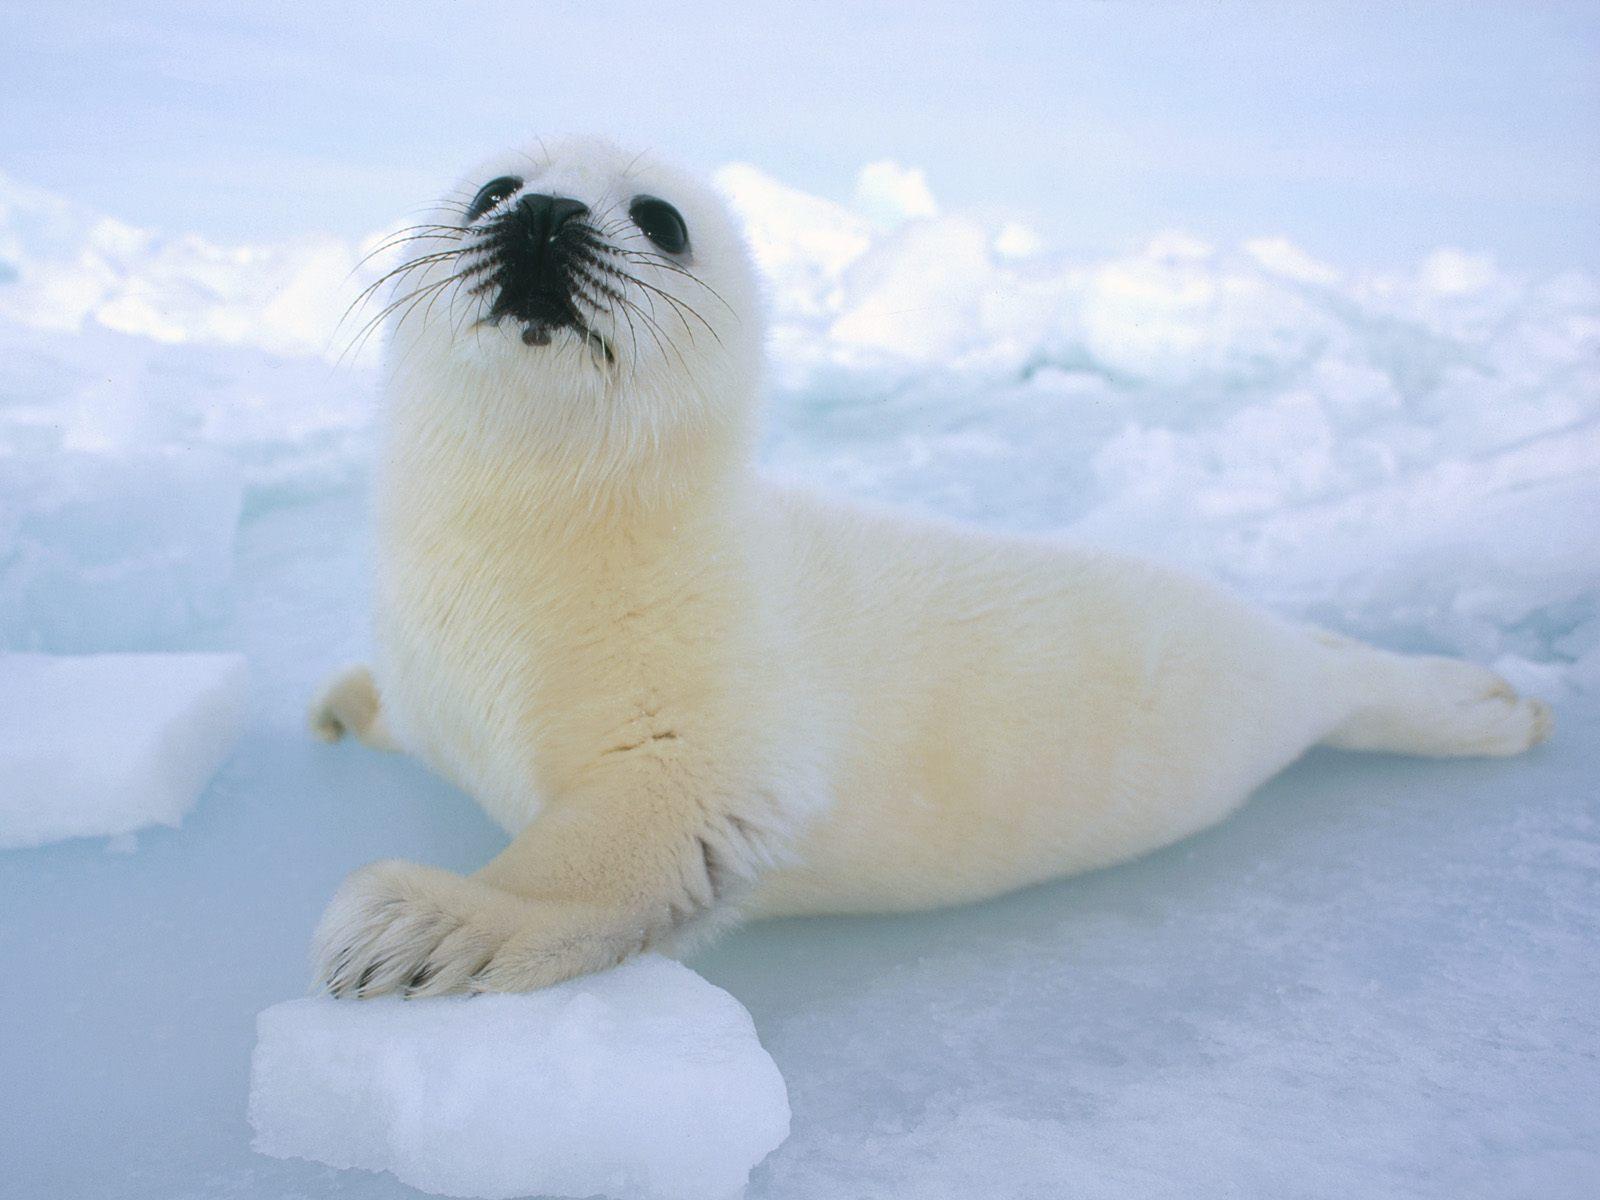 Cute Baby Harp Seal harp seals image